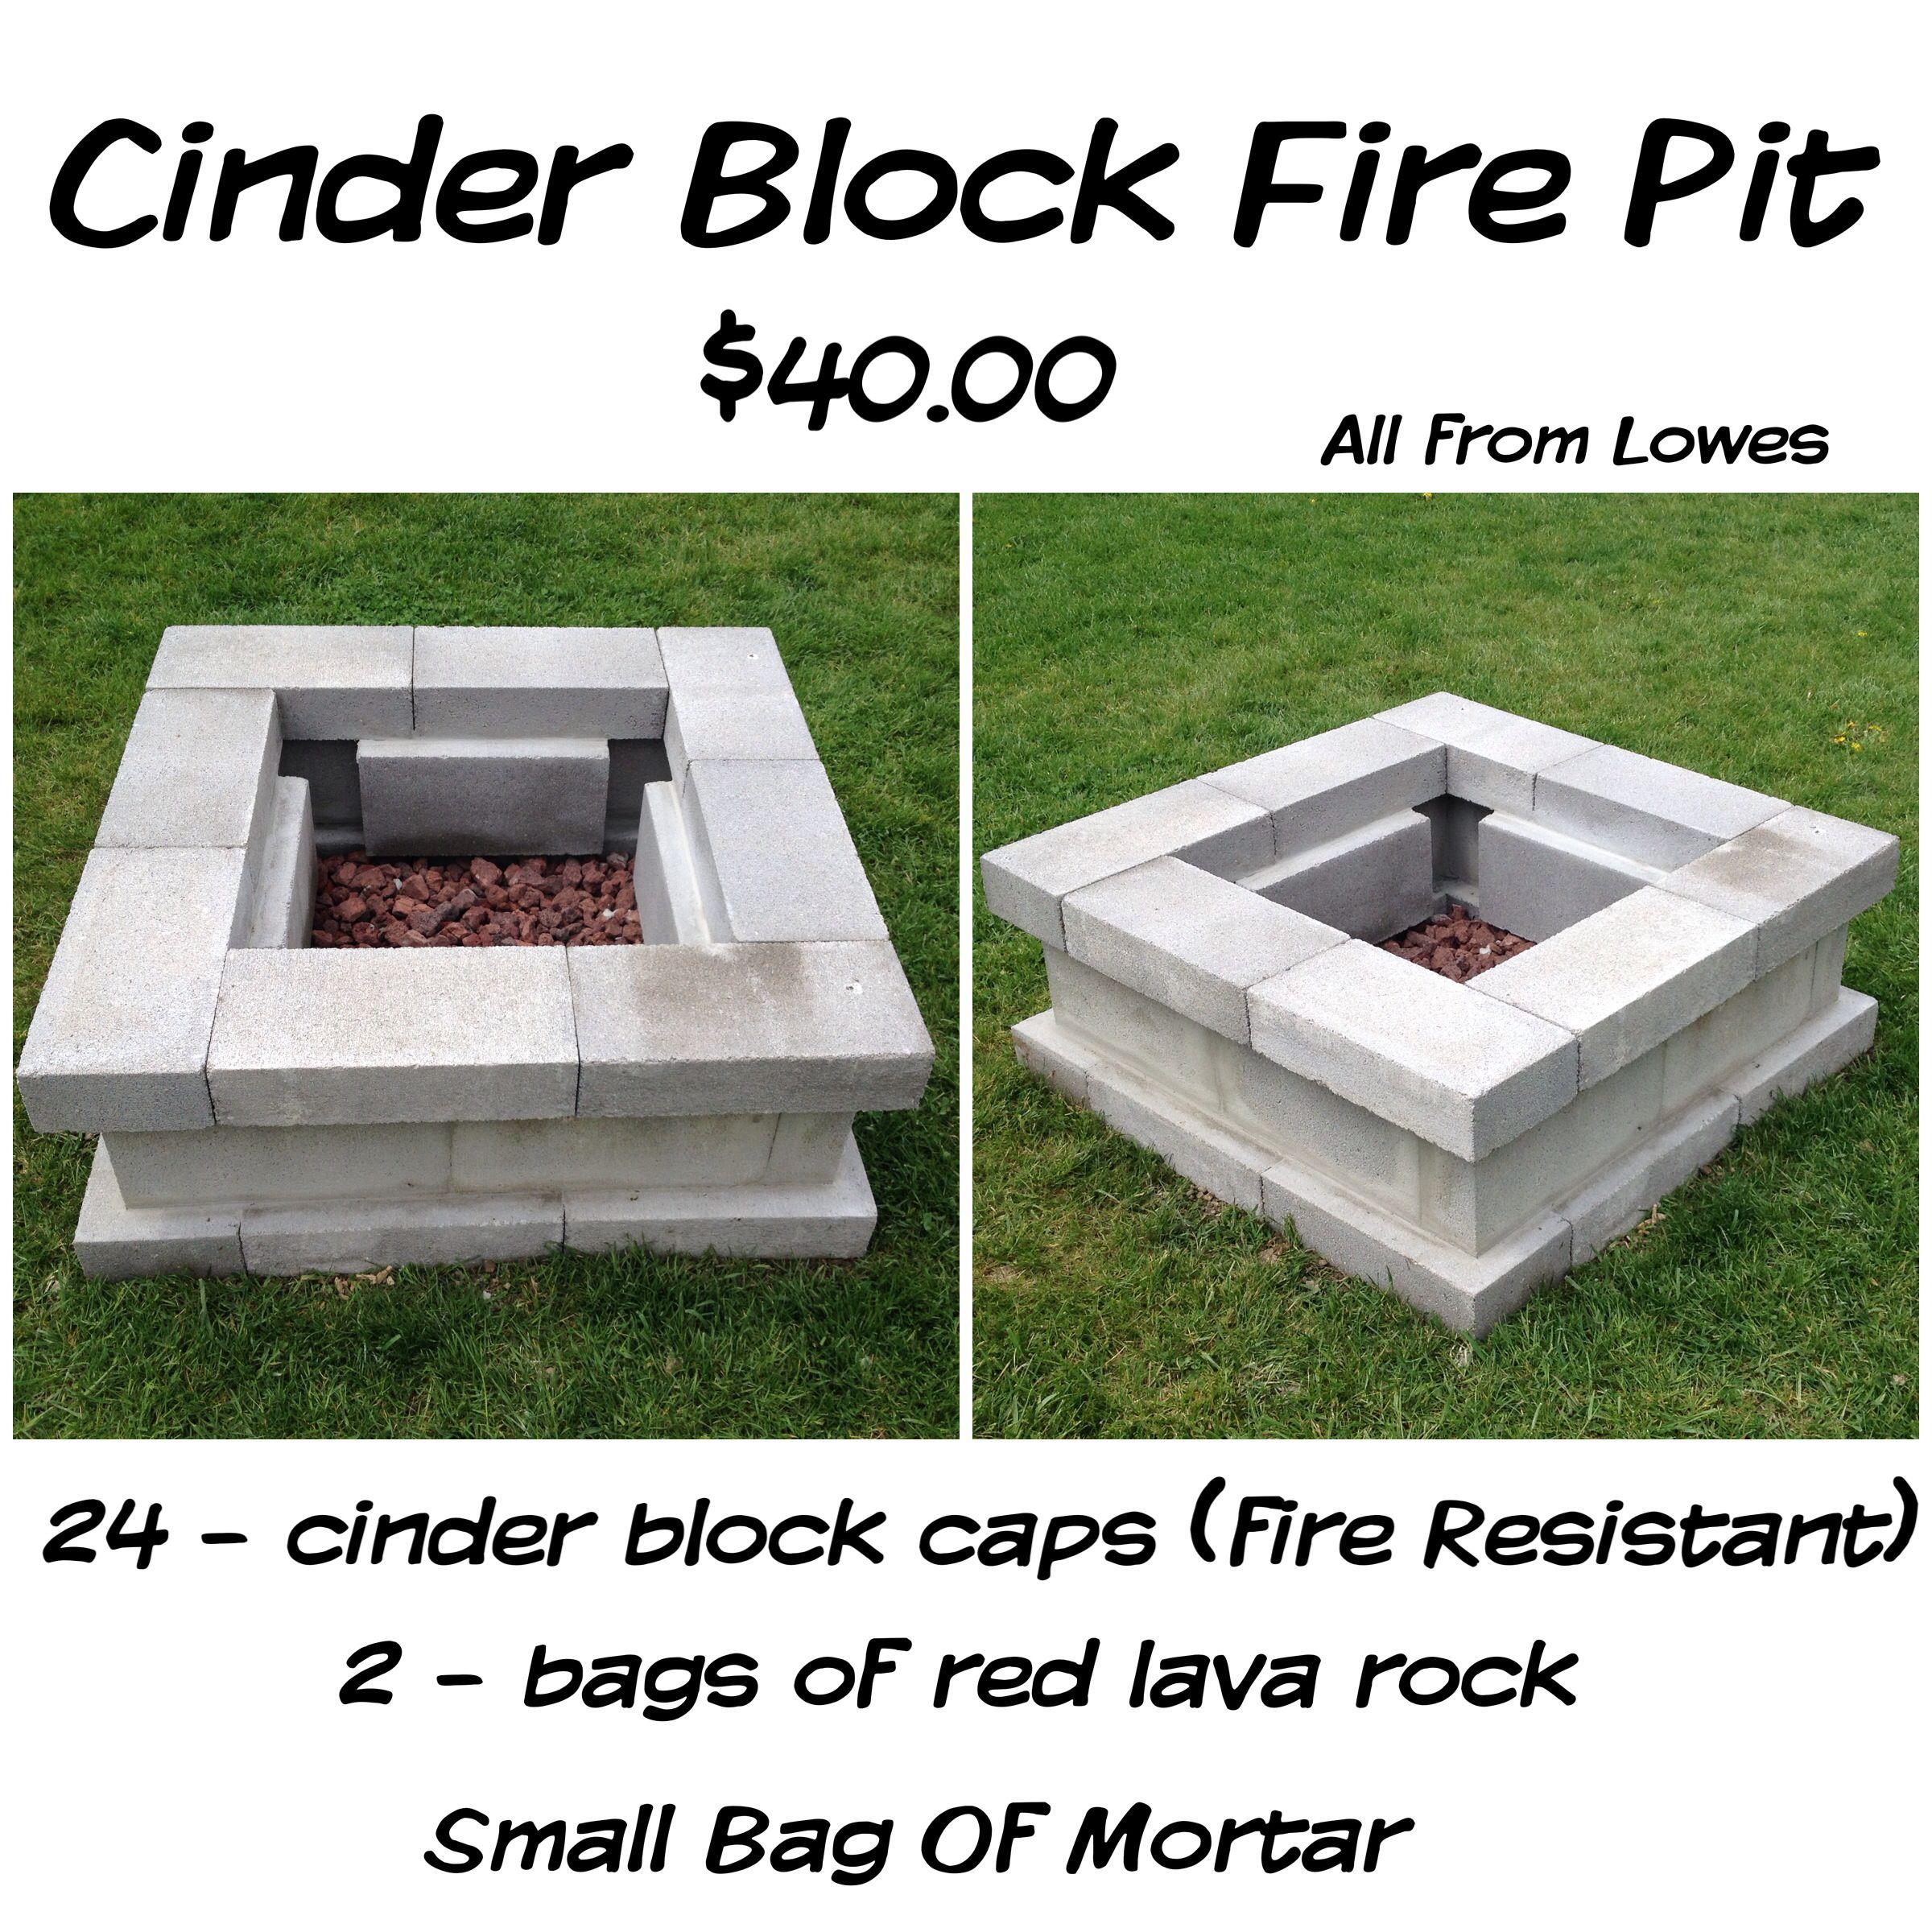 Cinder Block Fire Pit For Just 40 28 Cinder Block Caps Fire